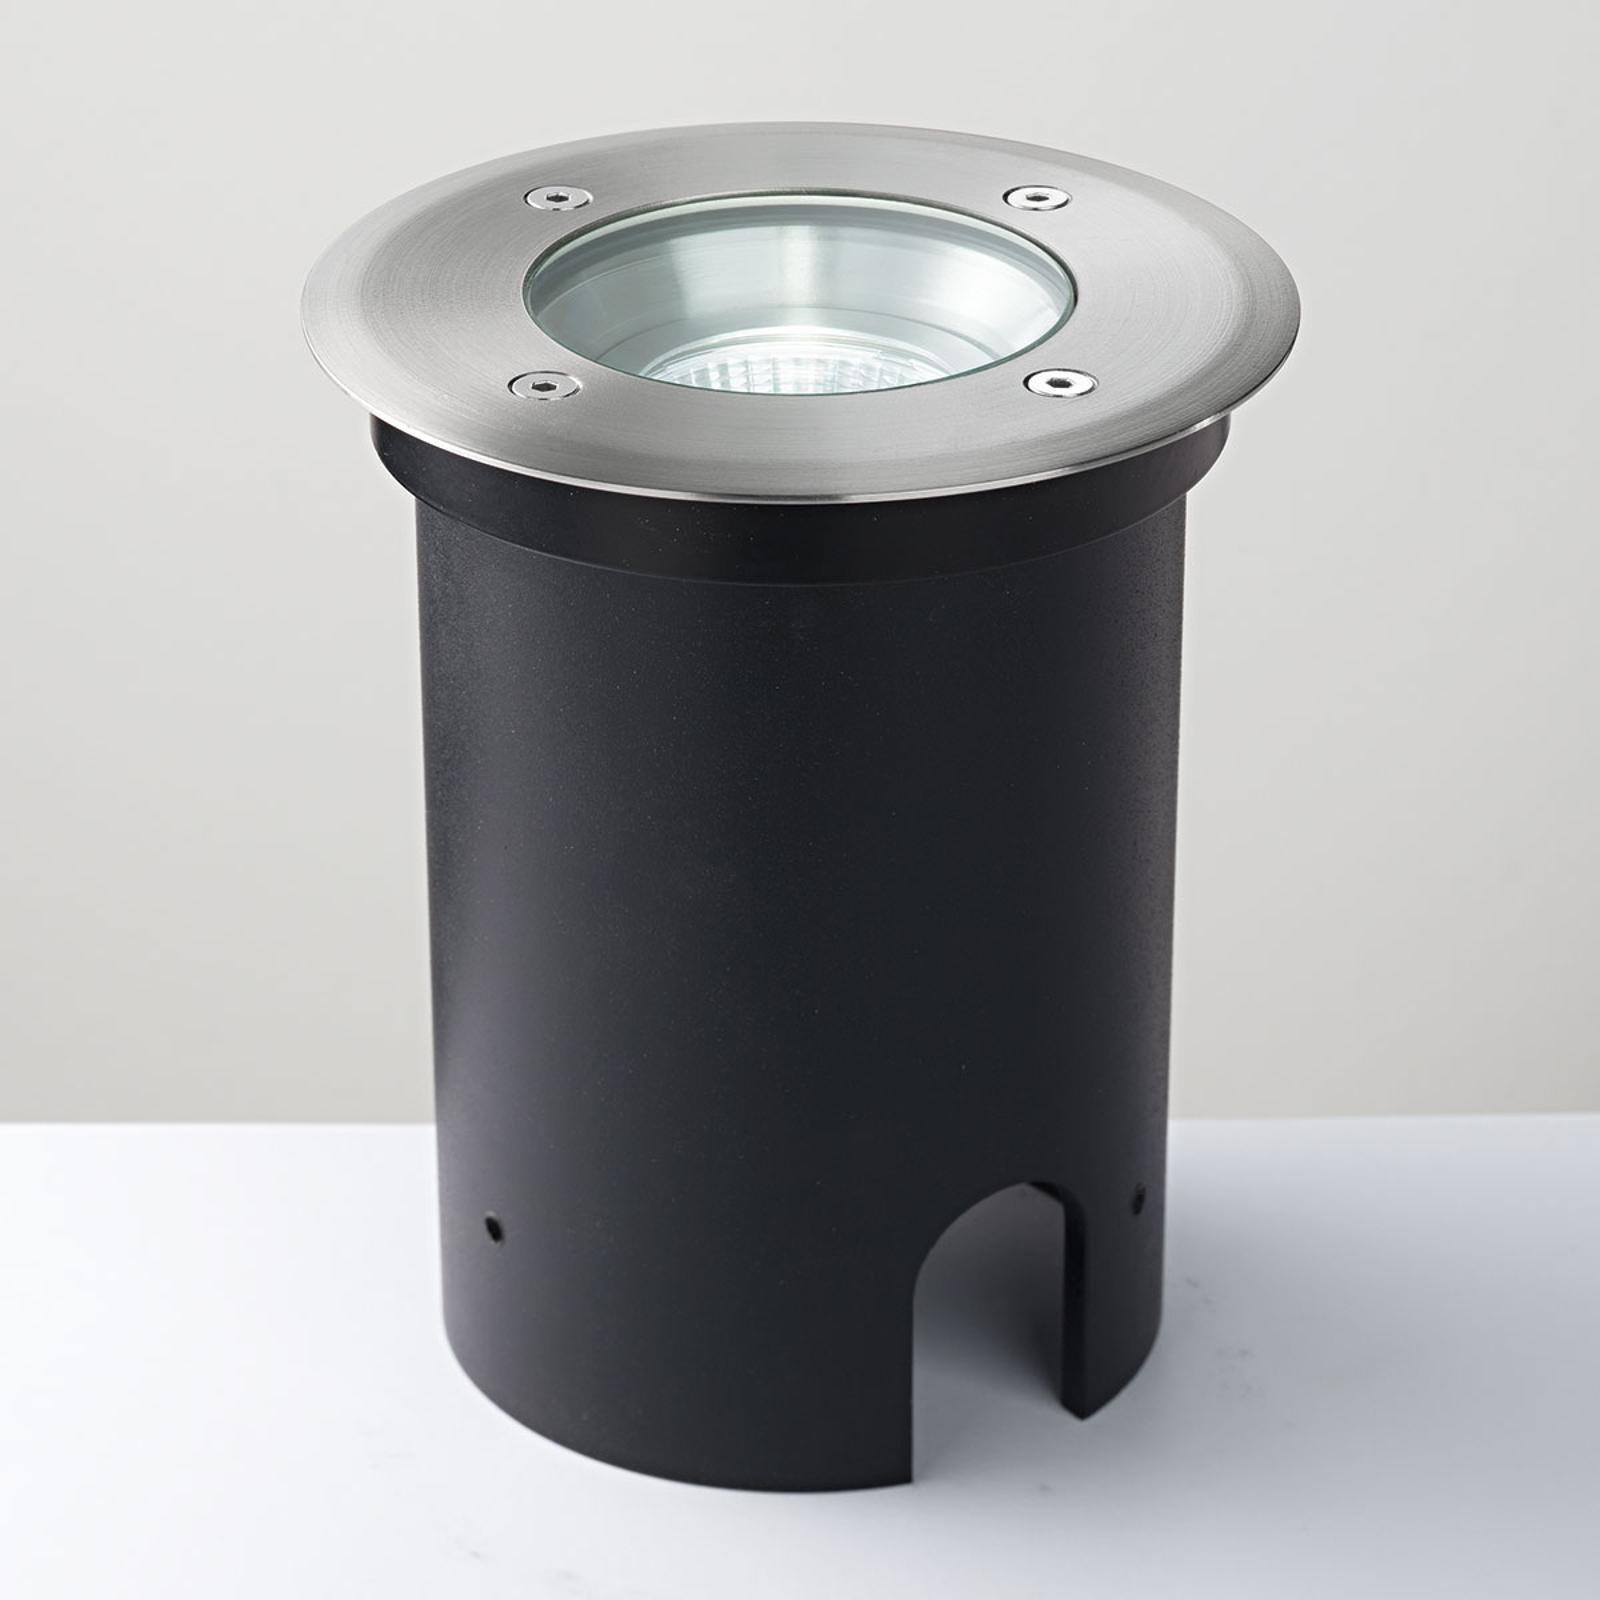 LED-lattiauppovalaisin Scotty 3, IP67